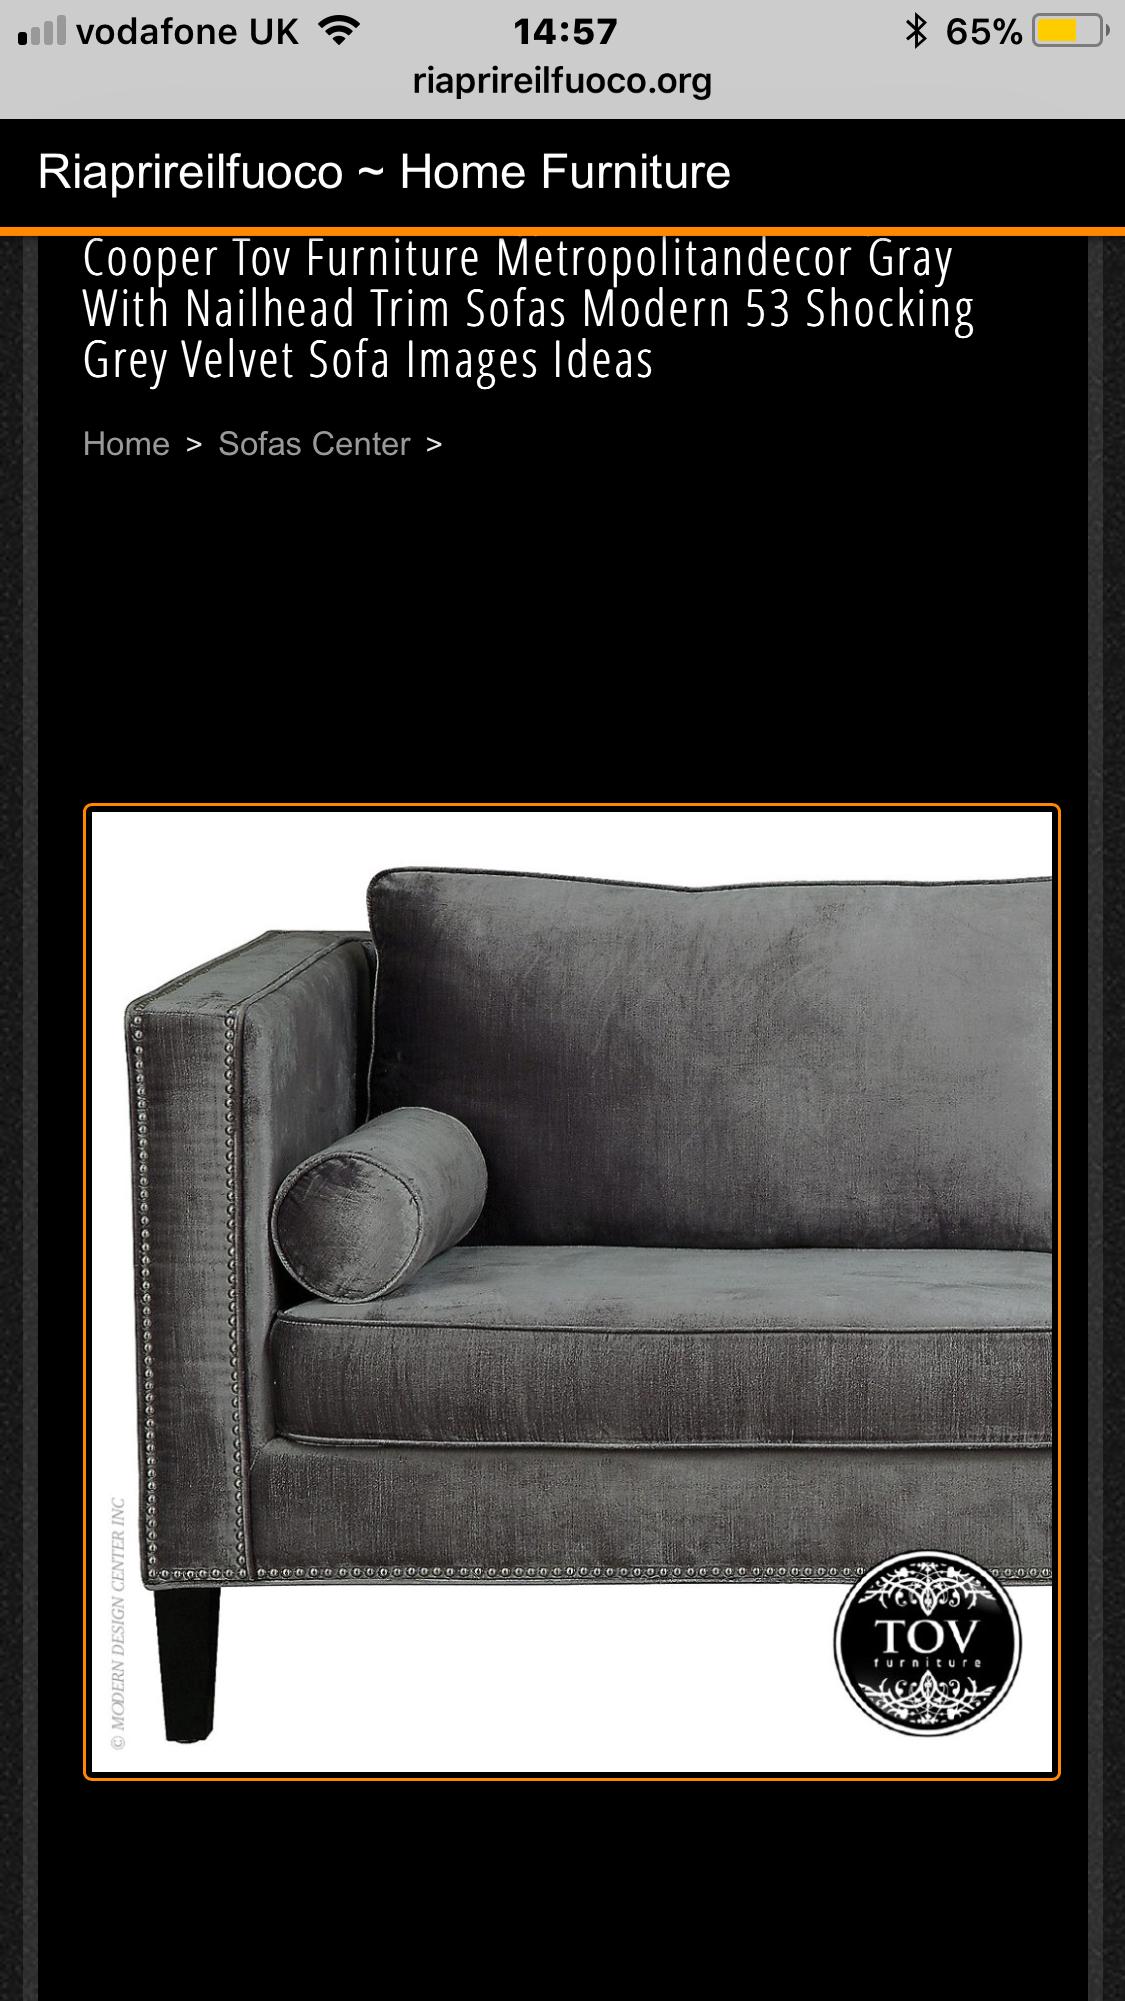 Sofa Images, Nailhead Trim Sofa